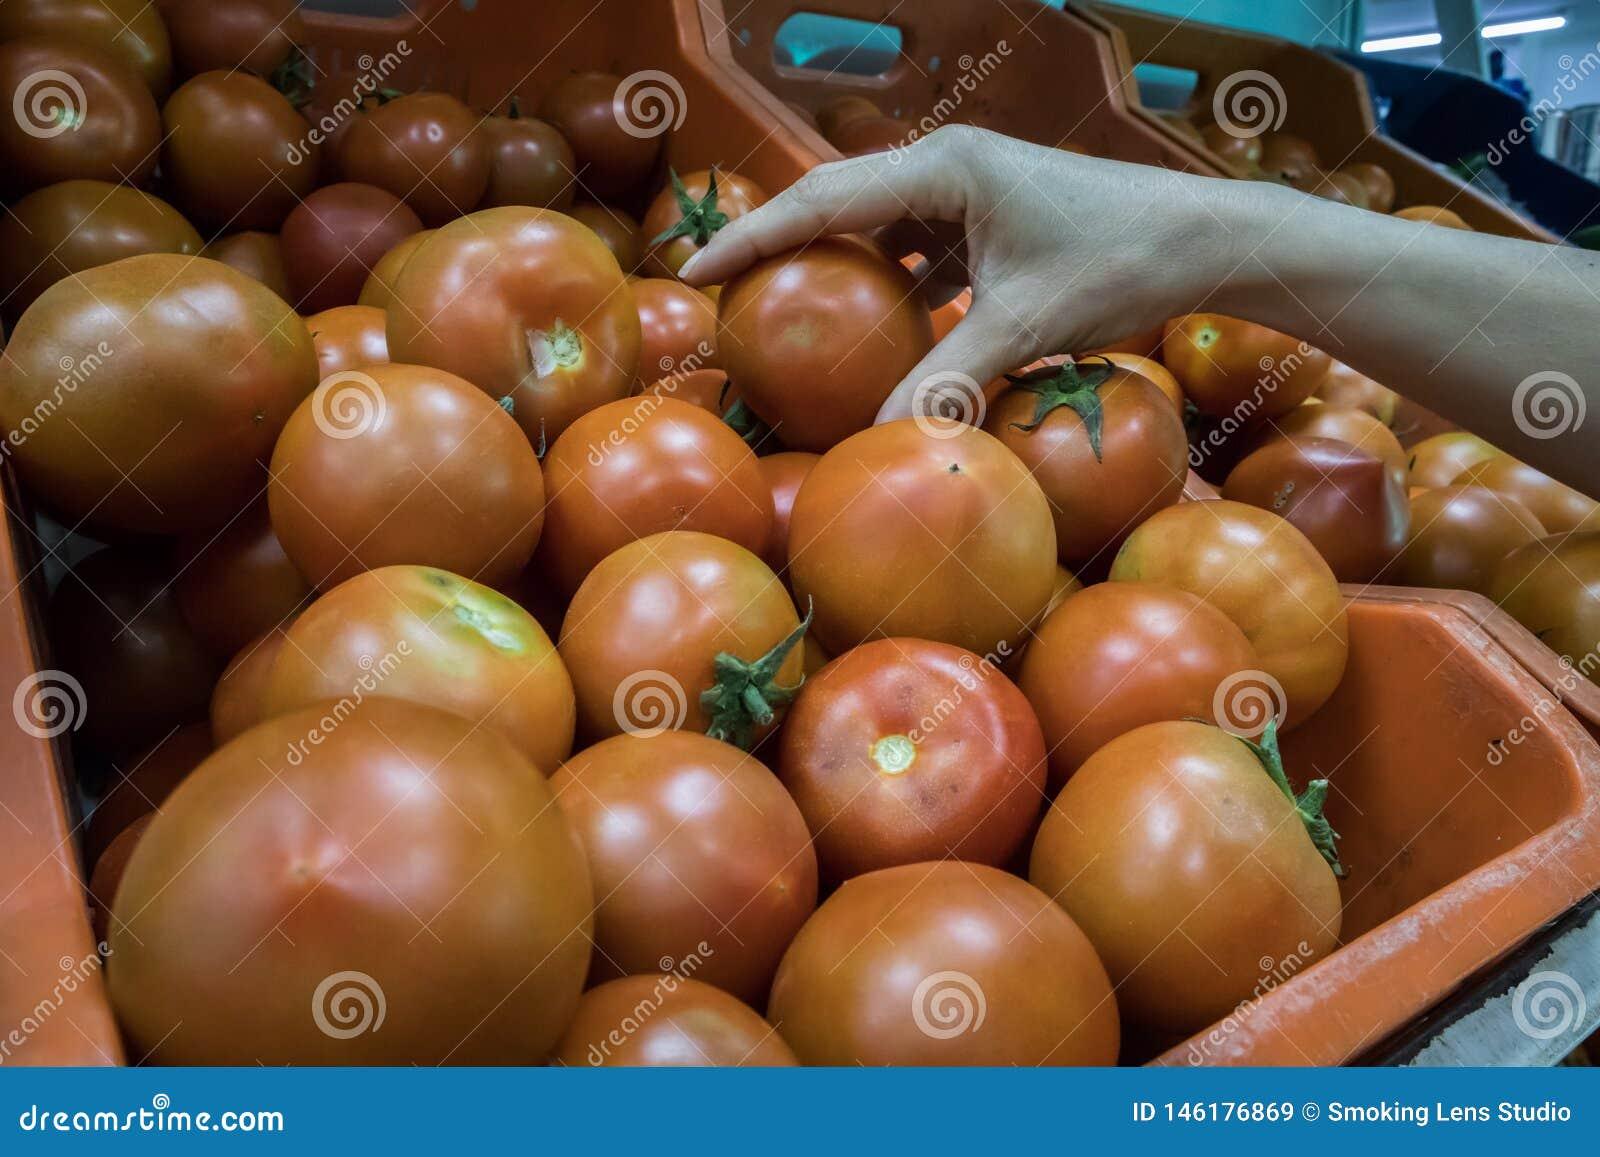 ?e?ska r?ka osi?ga szczyt pomidory w supermarkecie